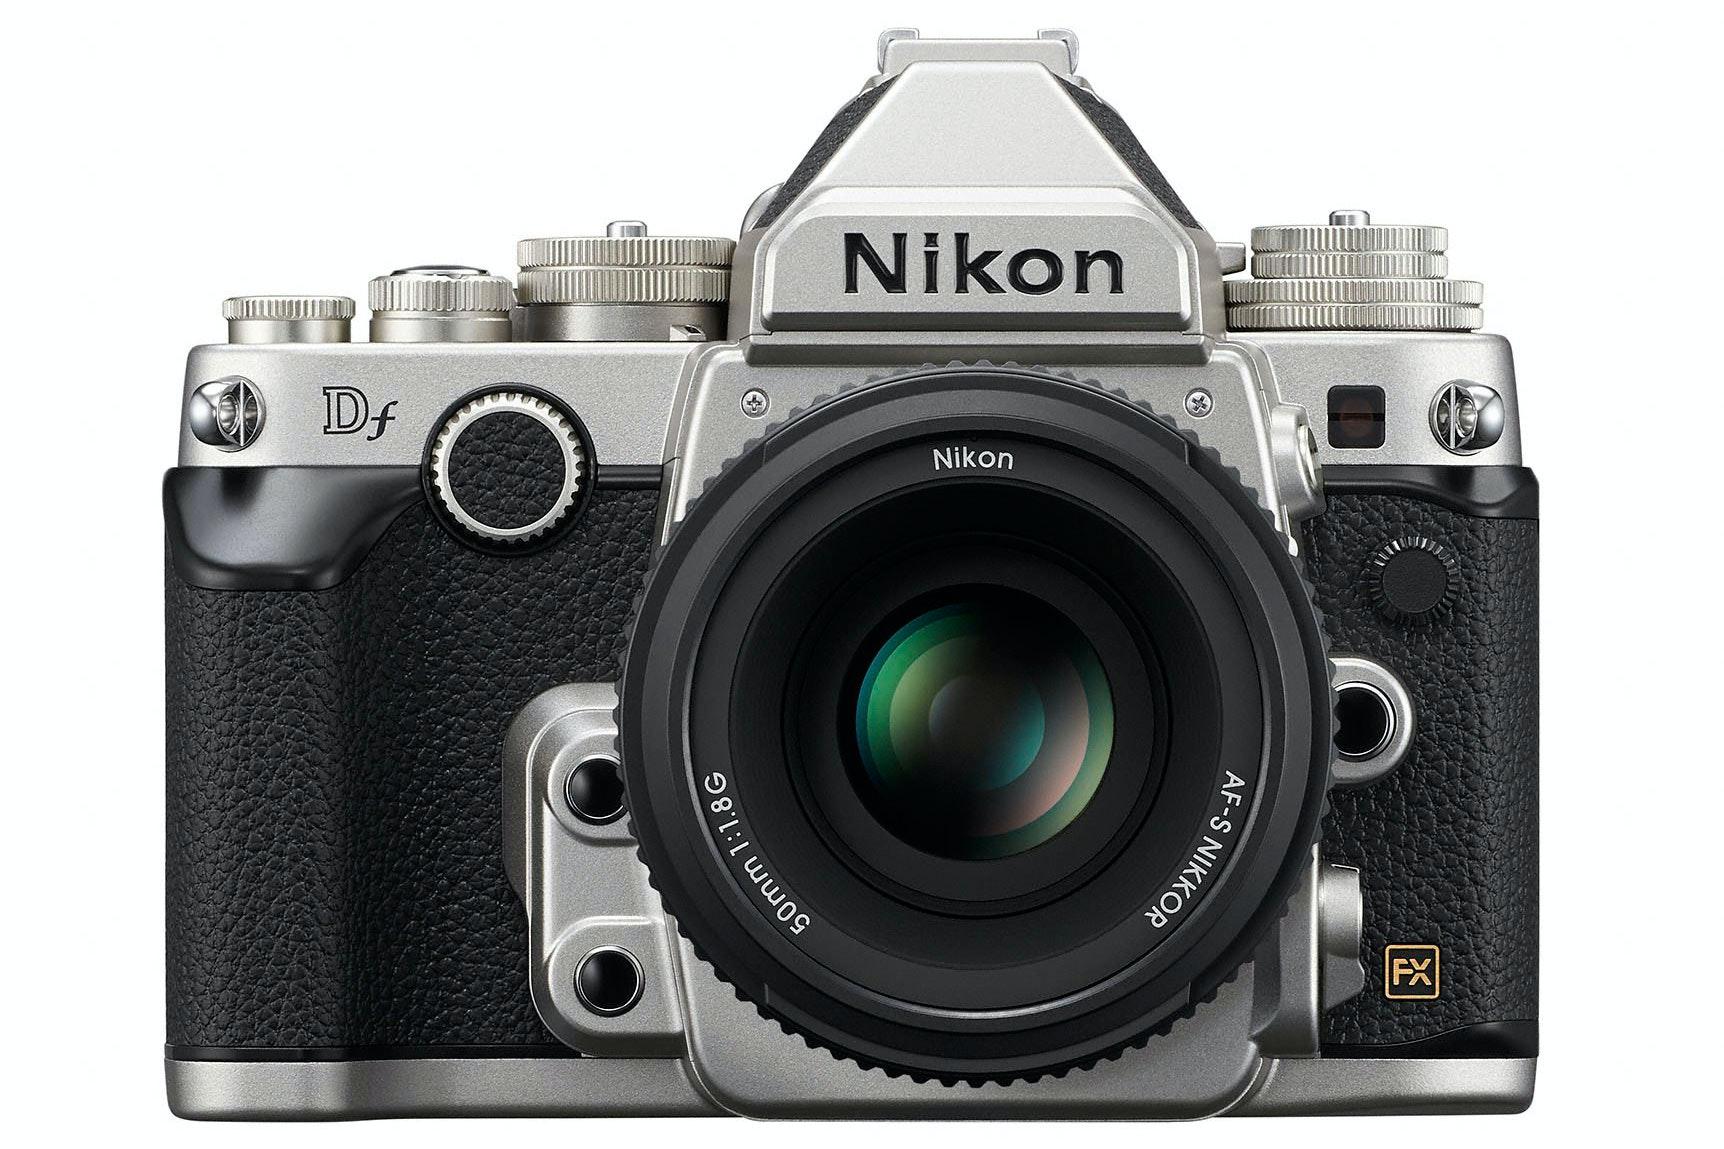 gamla nikon objektiv på nya kameror